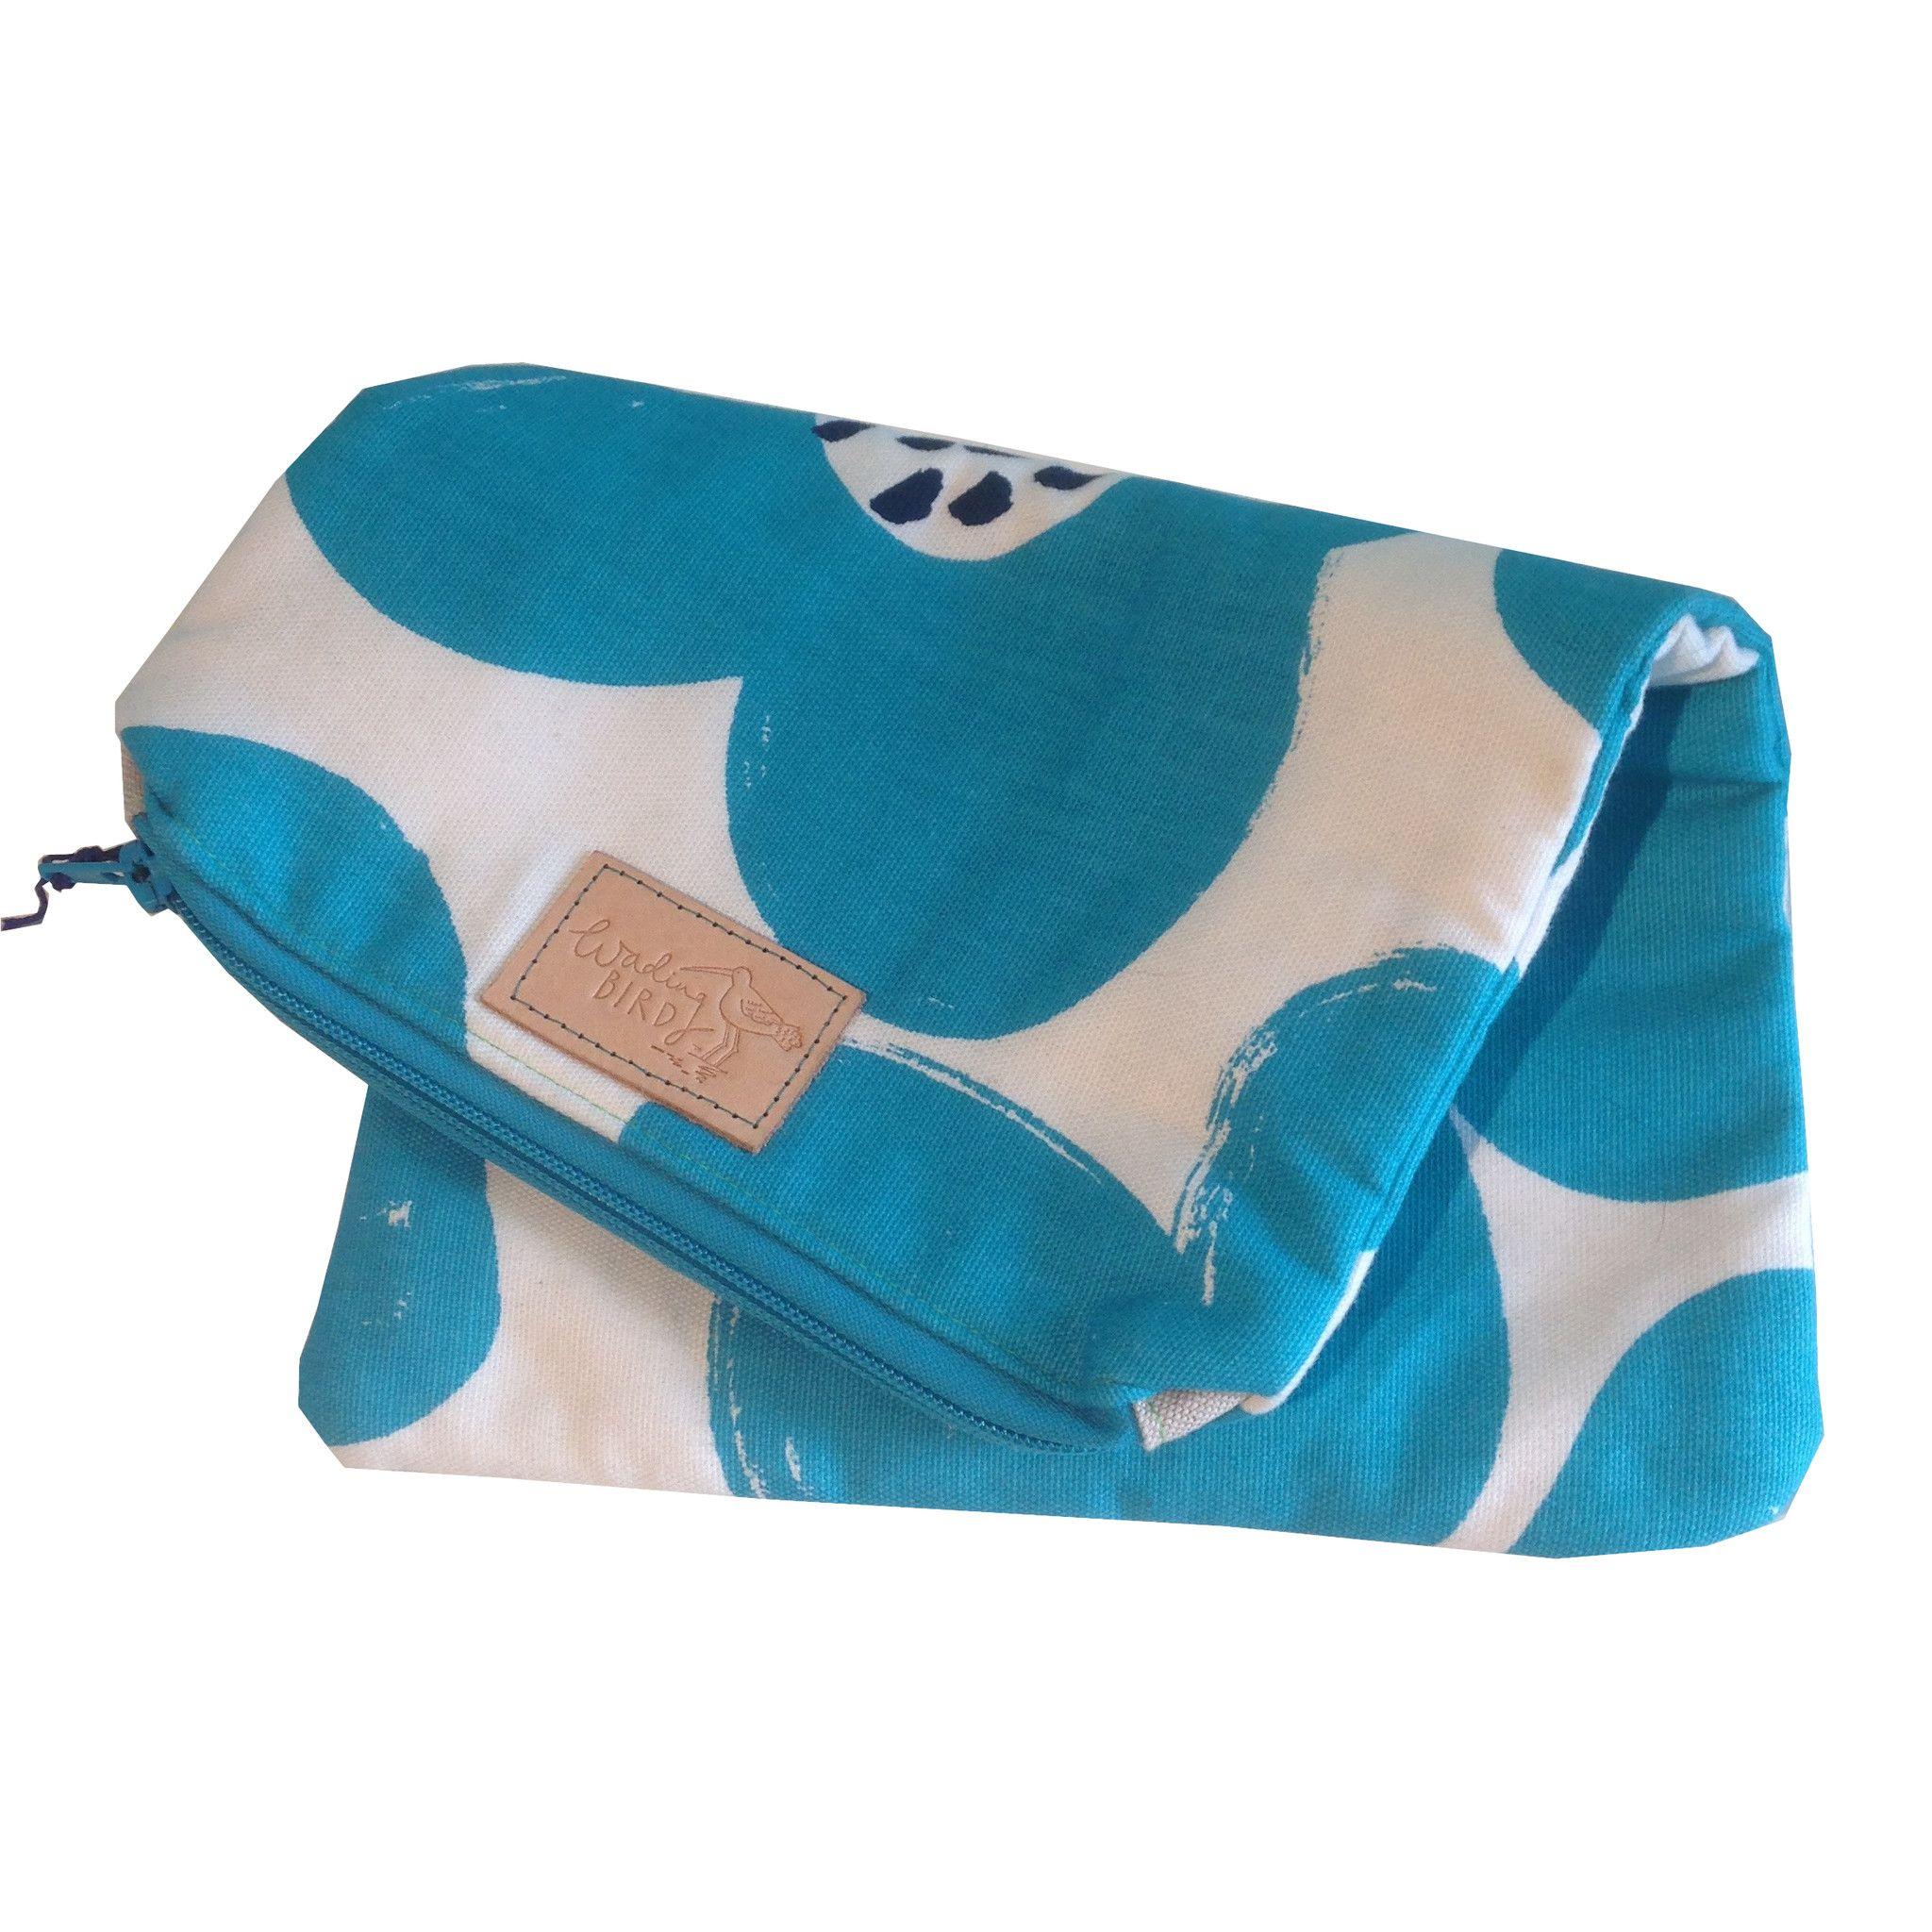 Wading Bird Handmade In Cornwall Folding Clutch Bag